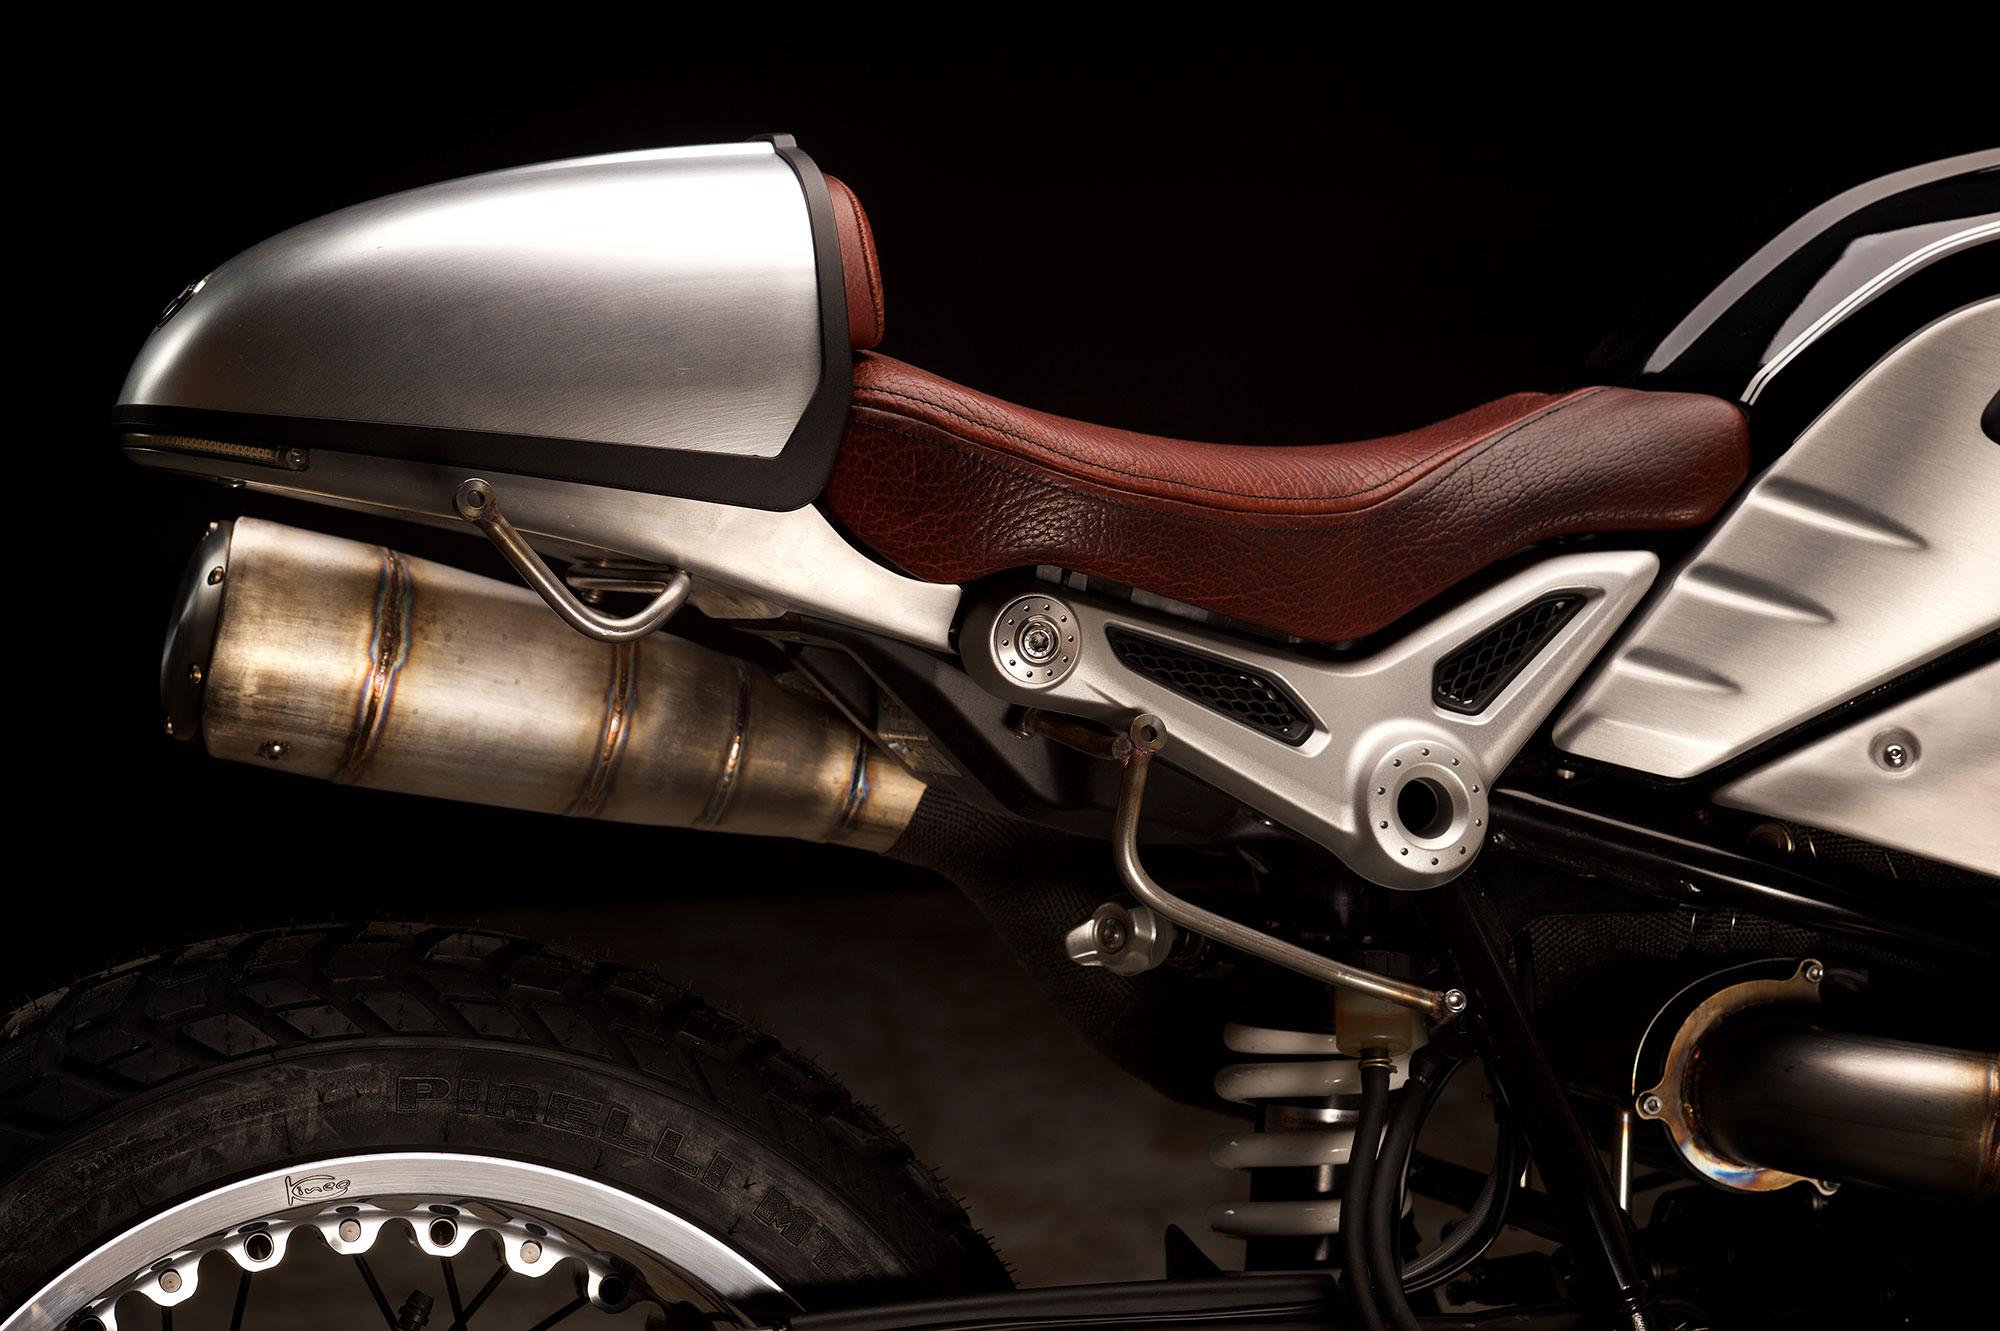 Revival-Cycles-Custom-Build-2014-BMW-RNineT-v2-073-2000w.jpg